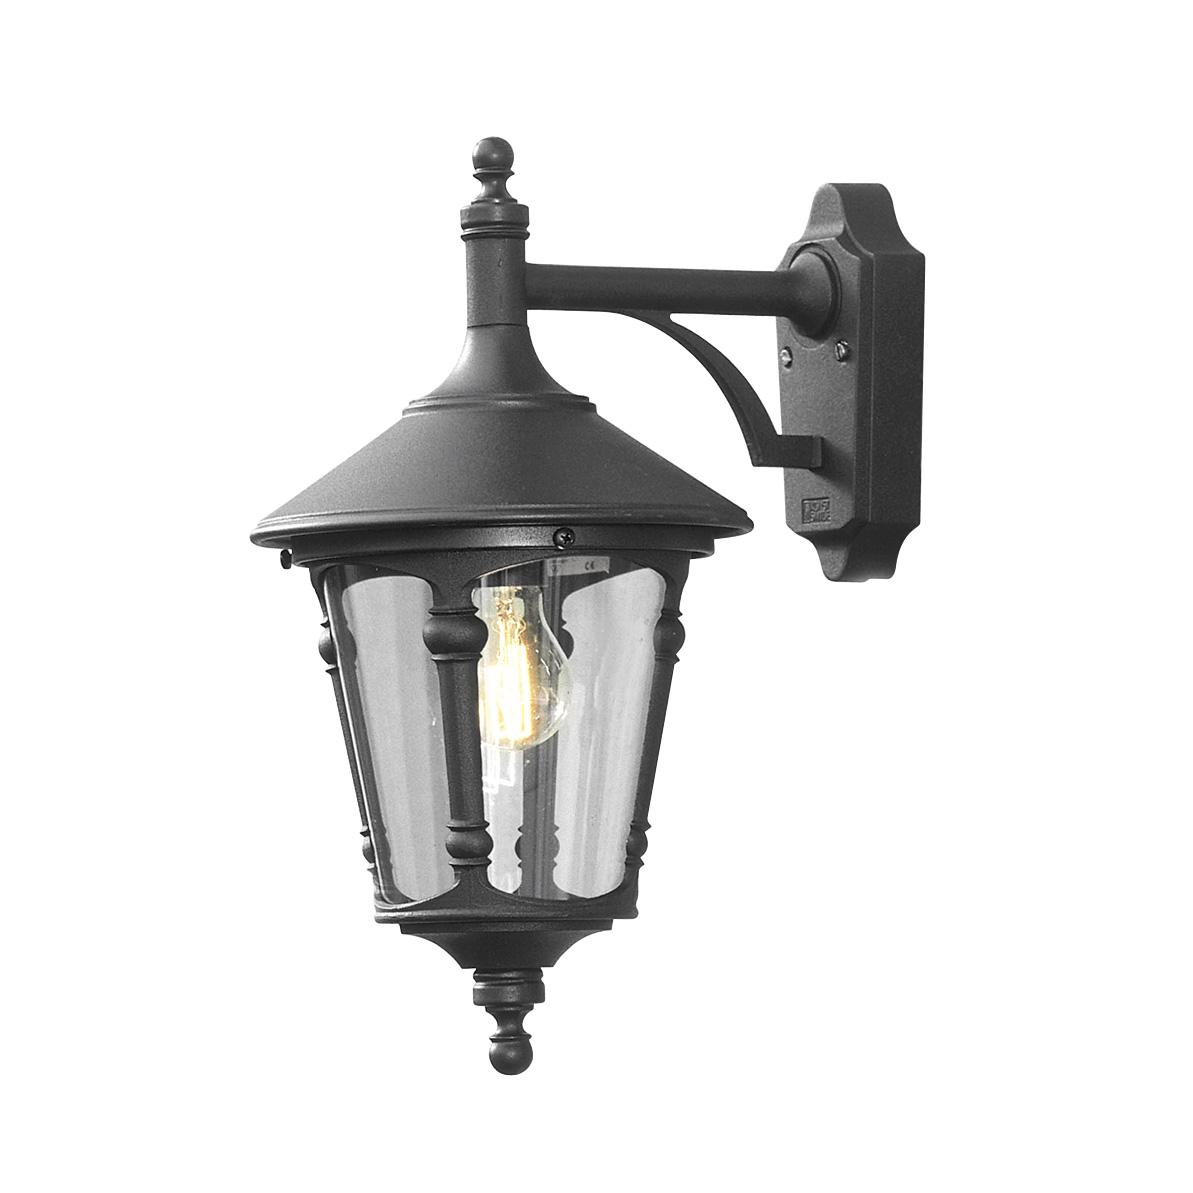 wandlamp virgo hanglamp zwart buitenlamp konstmide 568 750. Black Bedroom Furniture Sets. Home Design Ideas